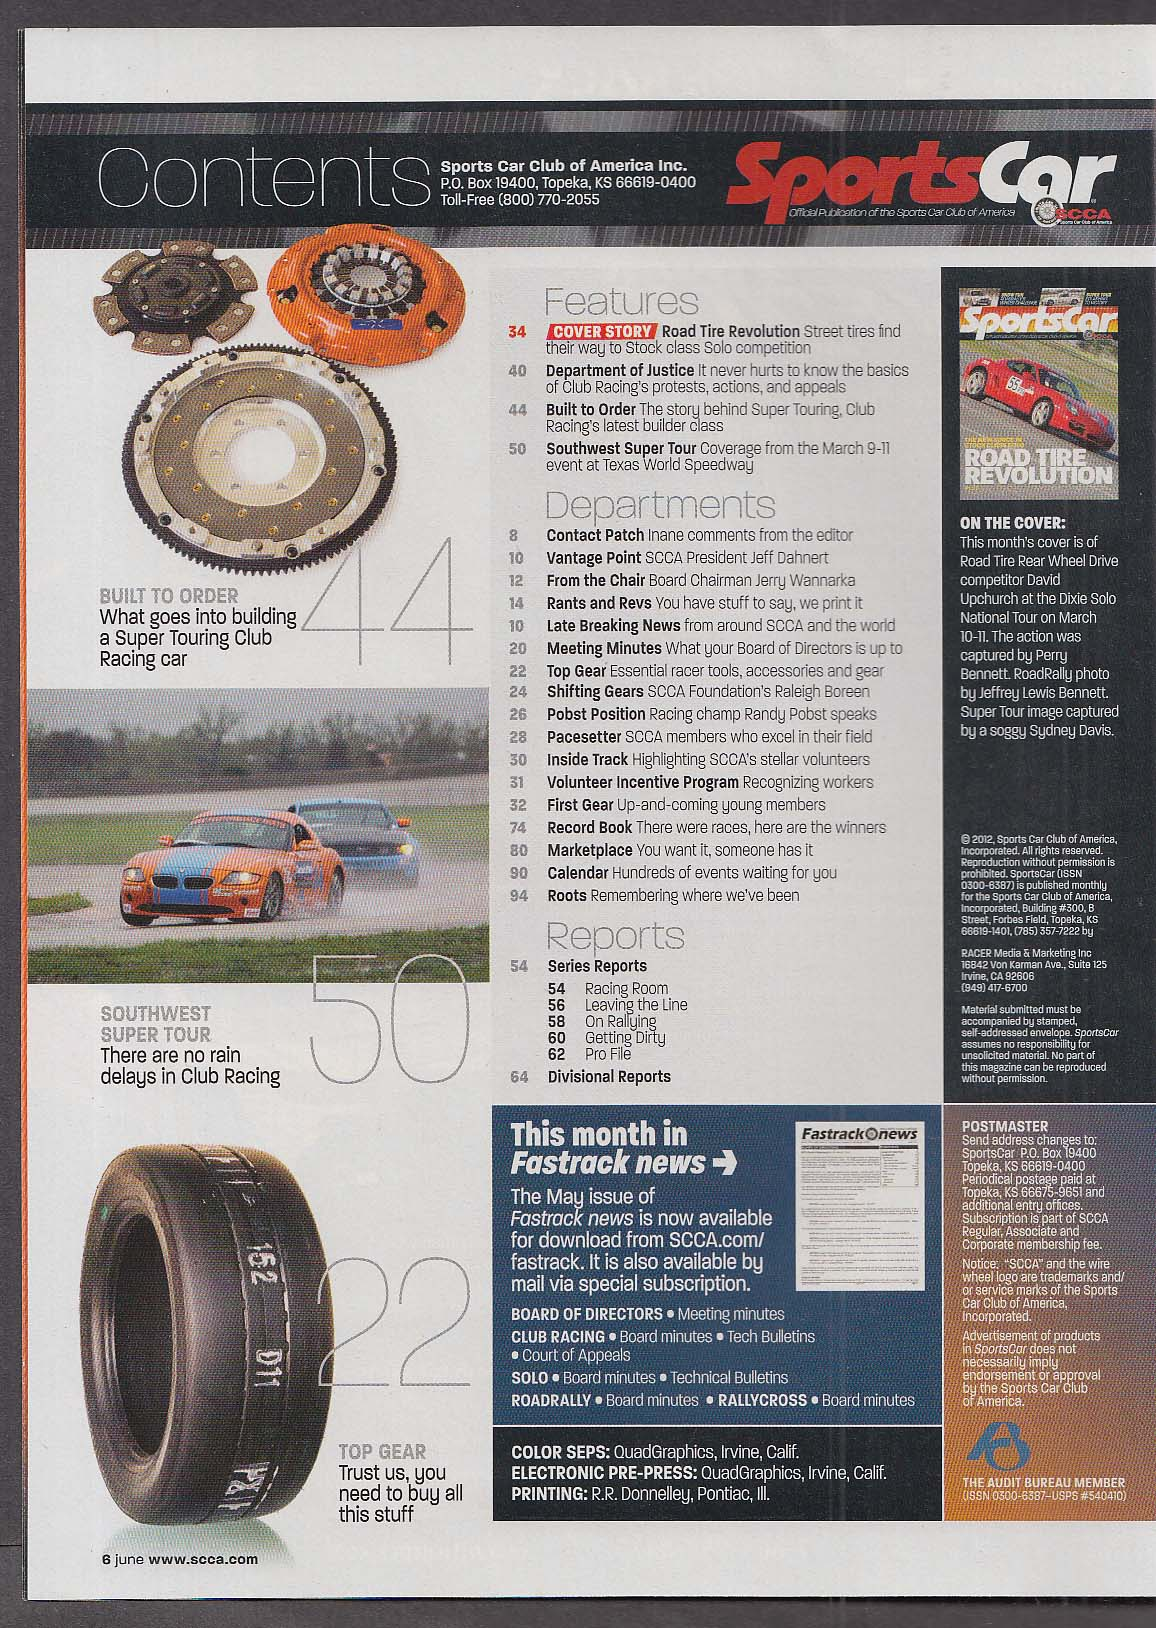 SCCA SPORTS CAR David Upchurch Road Tire Revolution Southwestern Super 6 2012